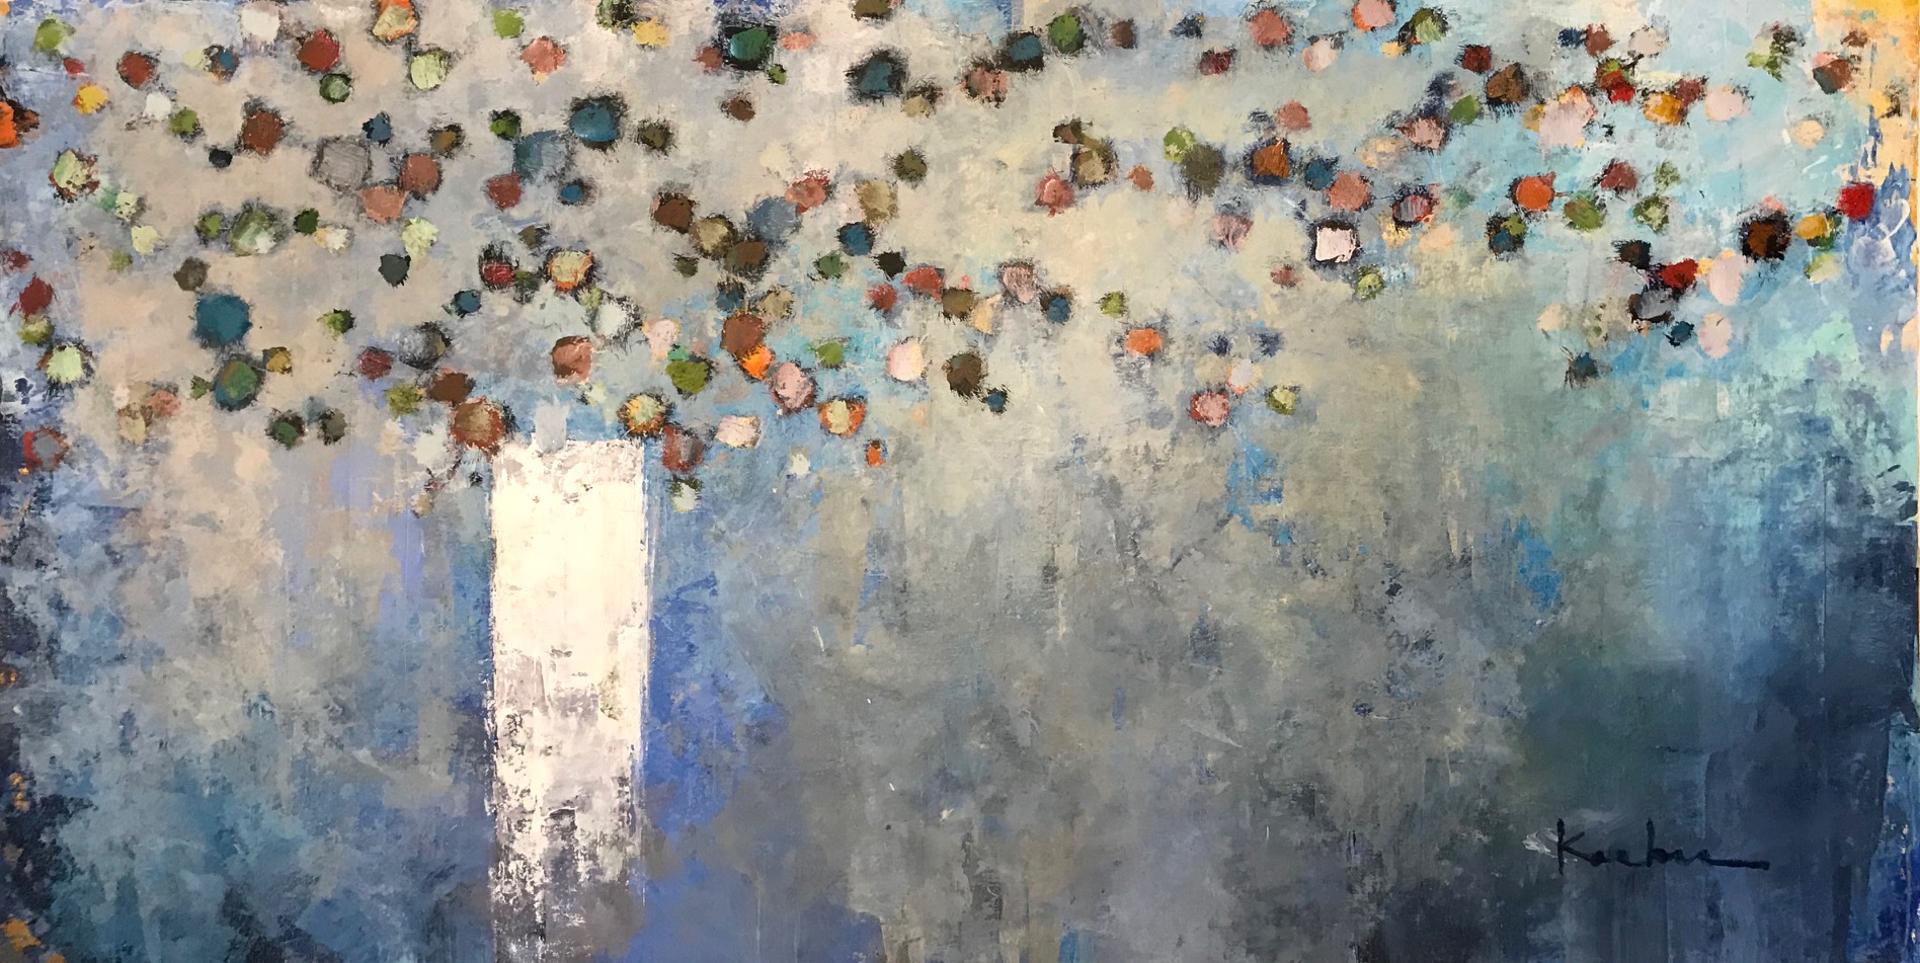 Esoteric by Jeff Koehn